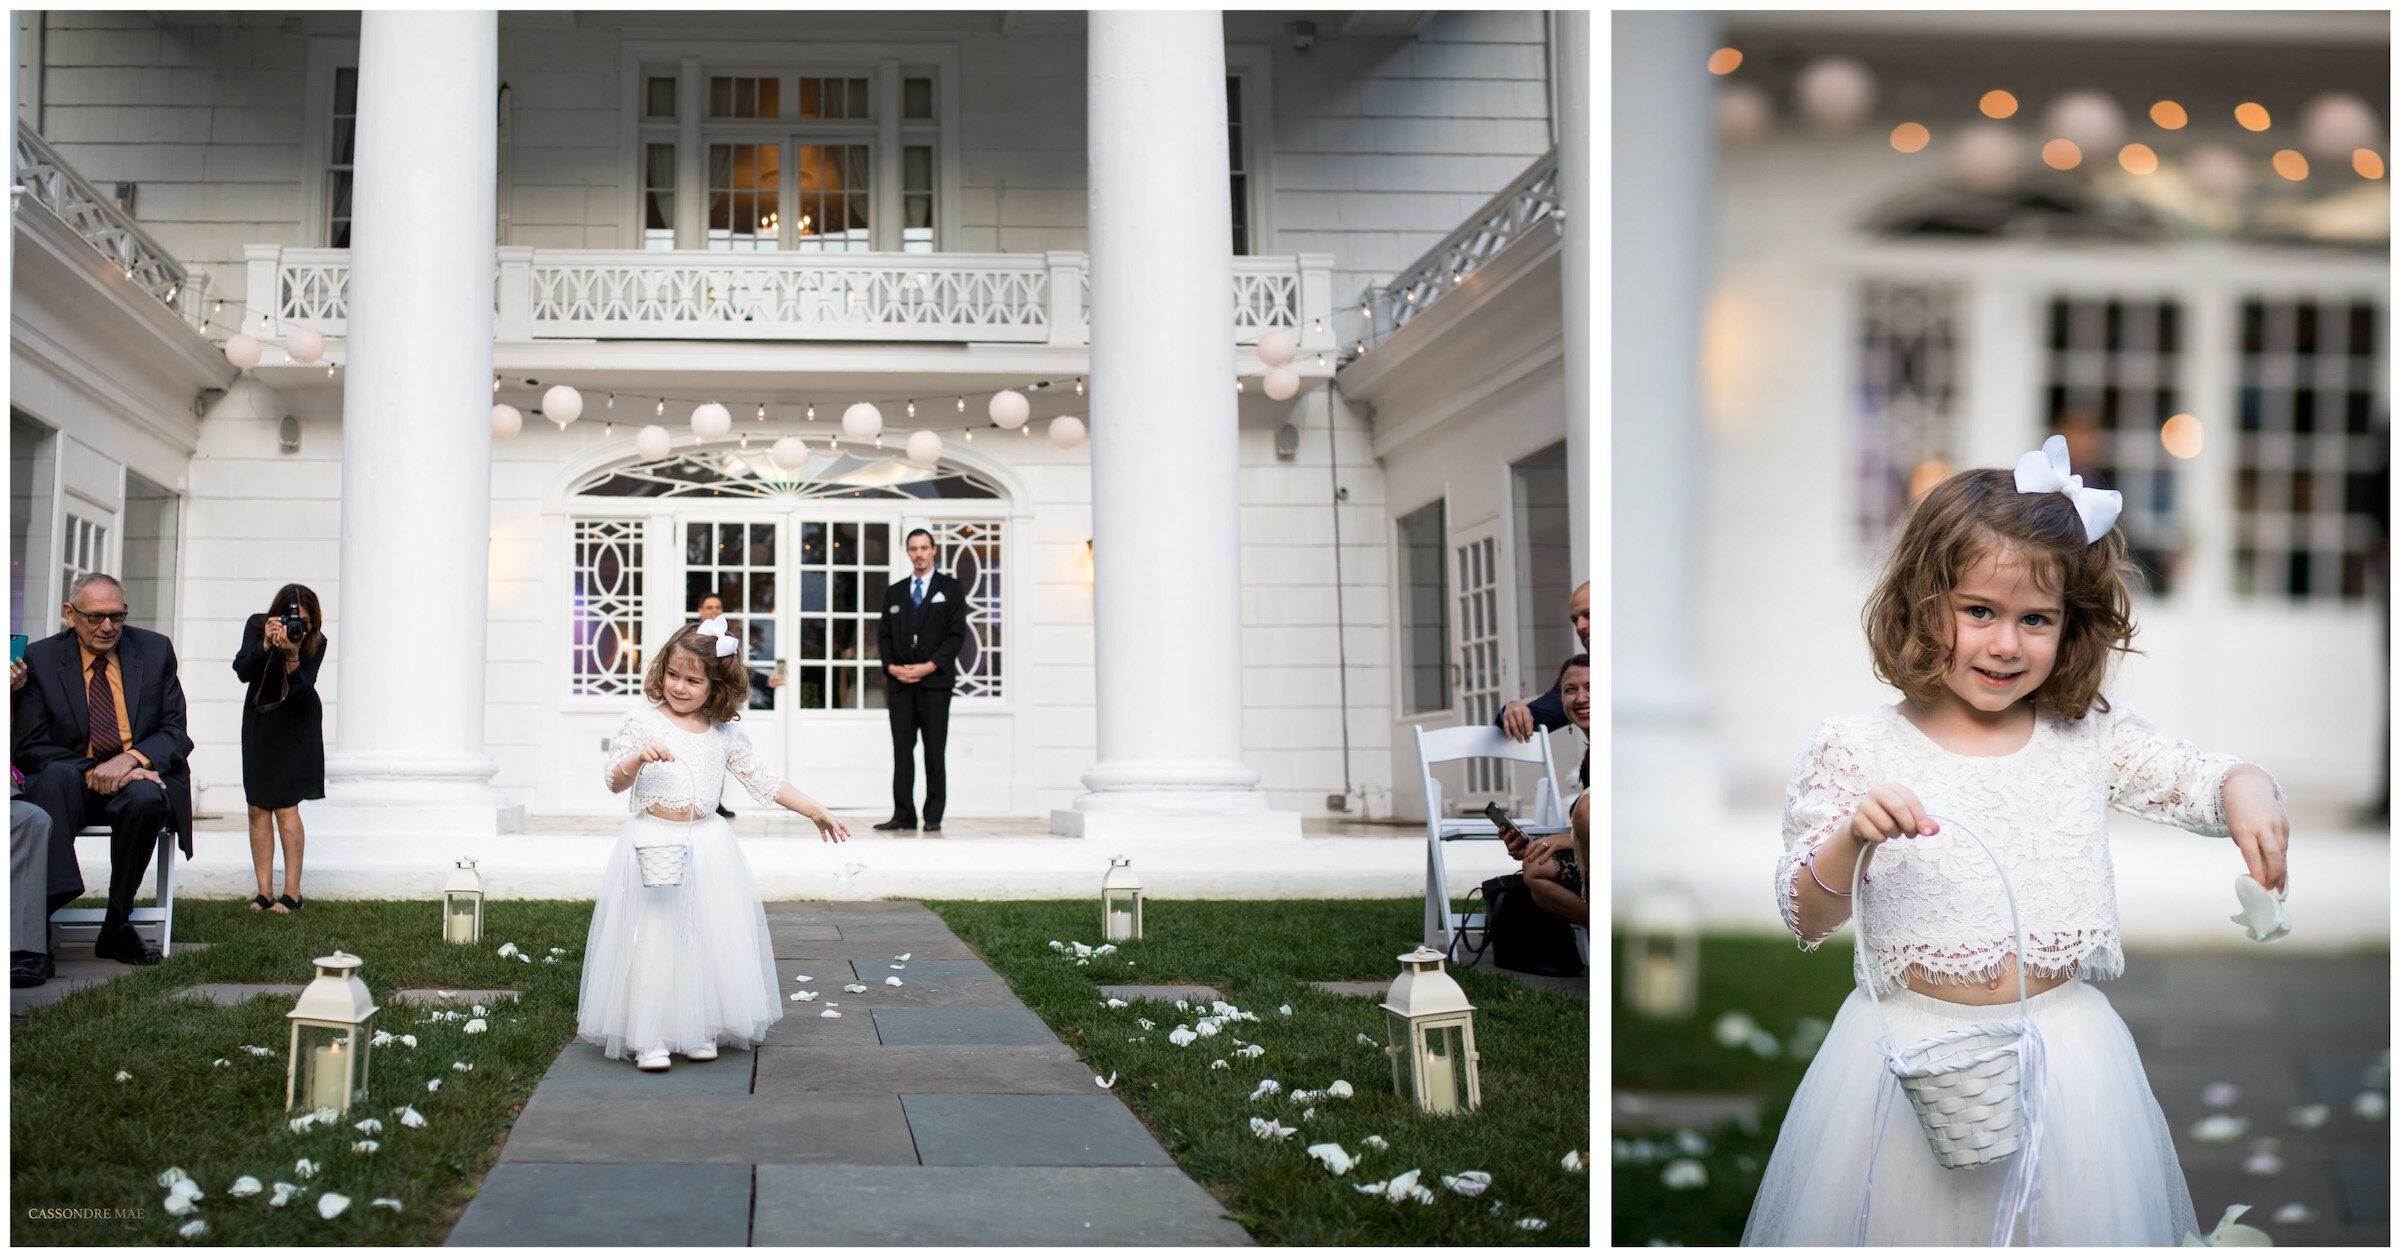 Cassondre Mae Photography Briarcliff Manor Wedding Photographer 13.jpg